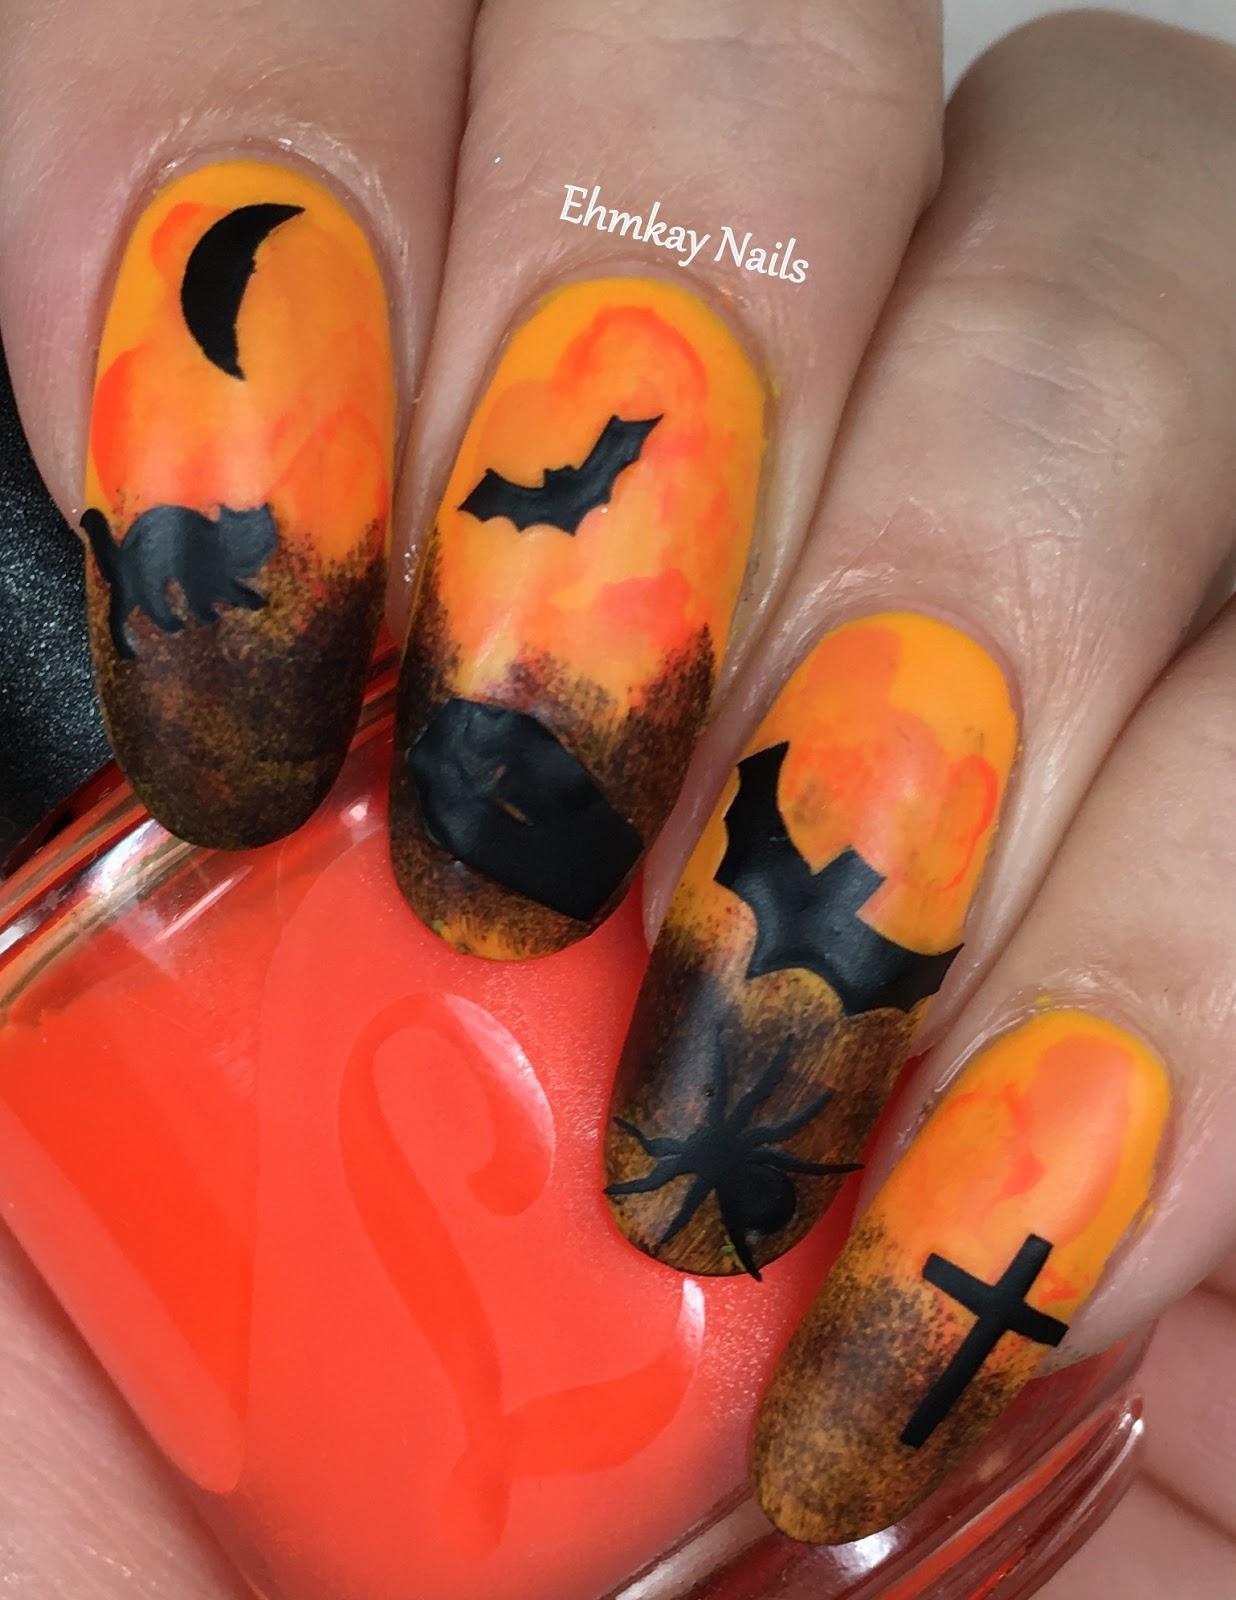 ehmkay nails: Halloween Nail Art with Halloween Spooky ...